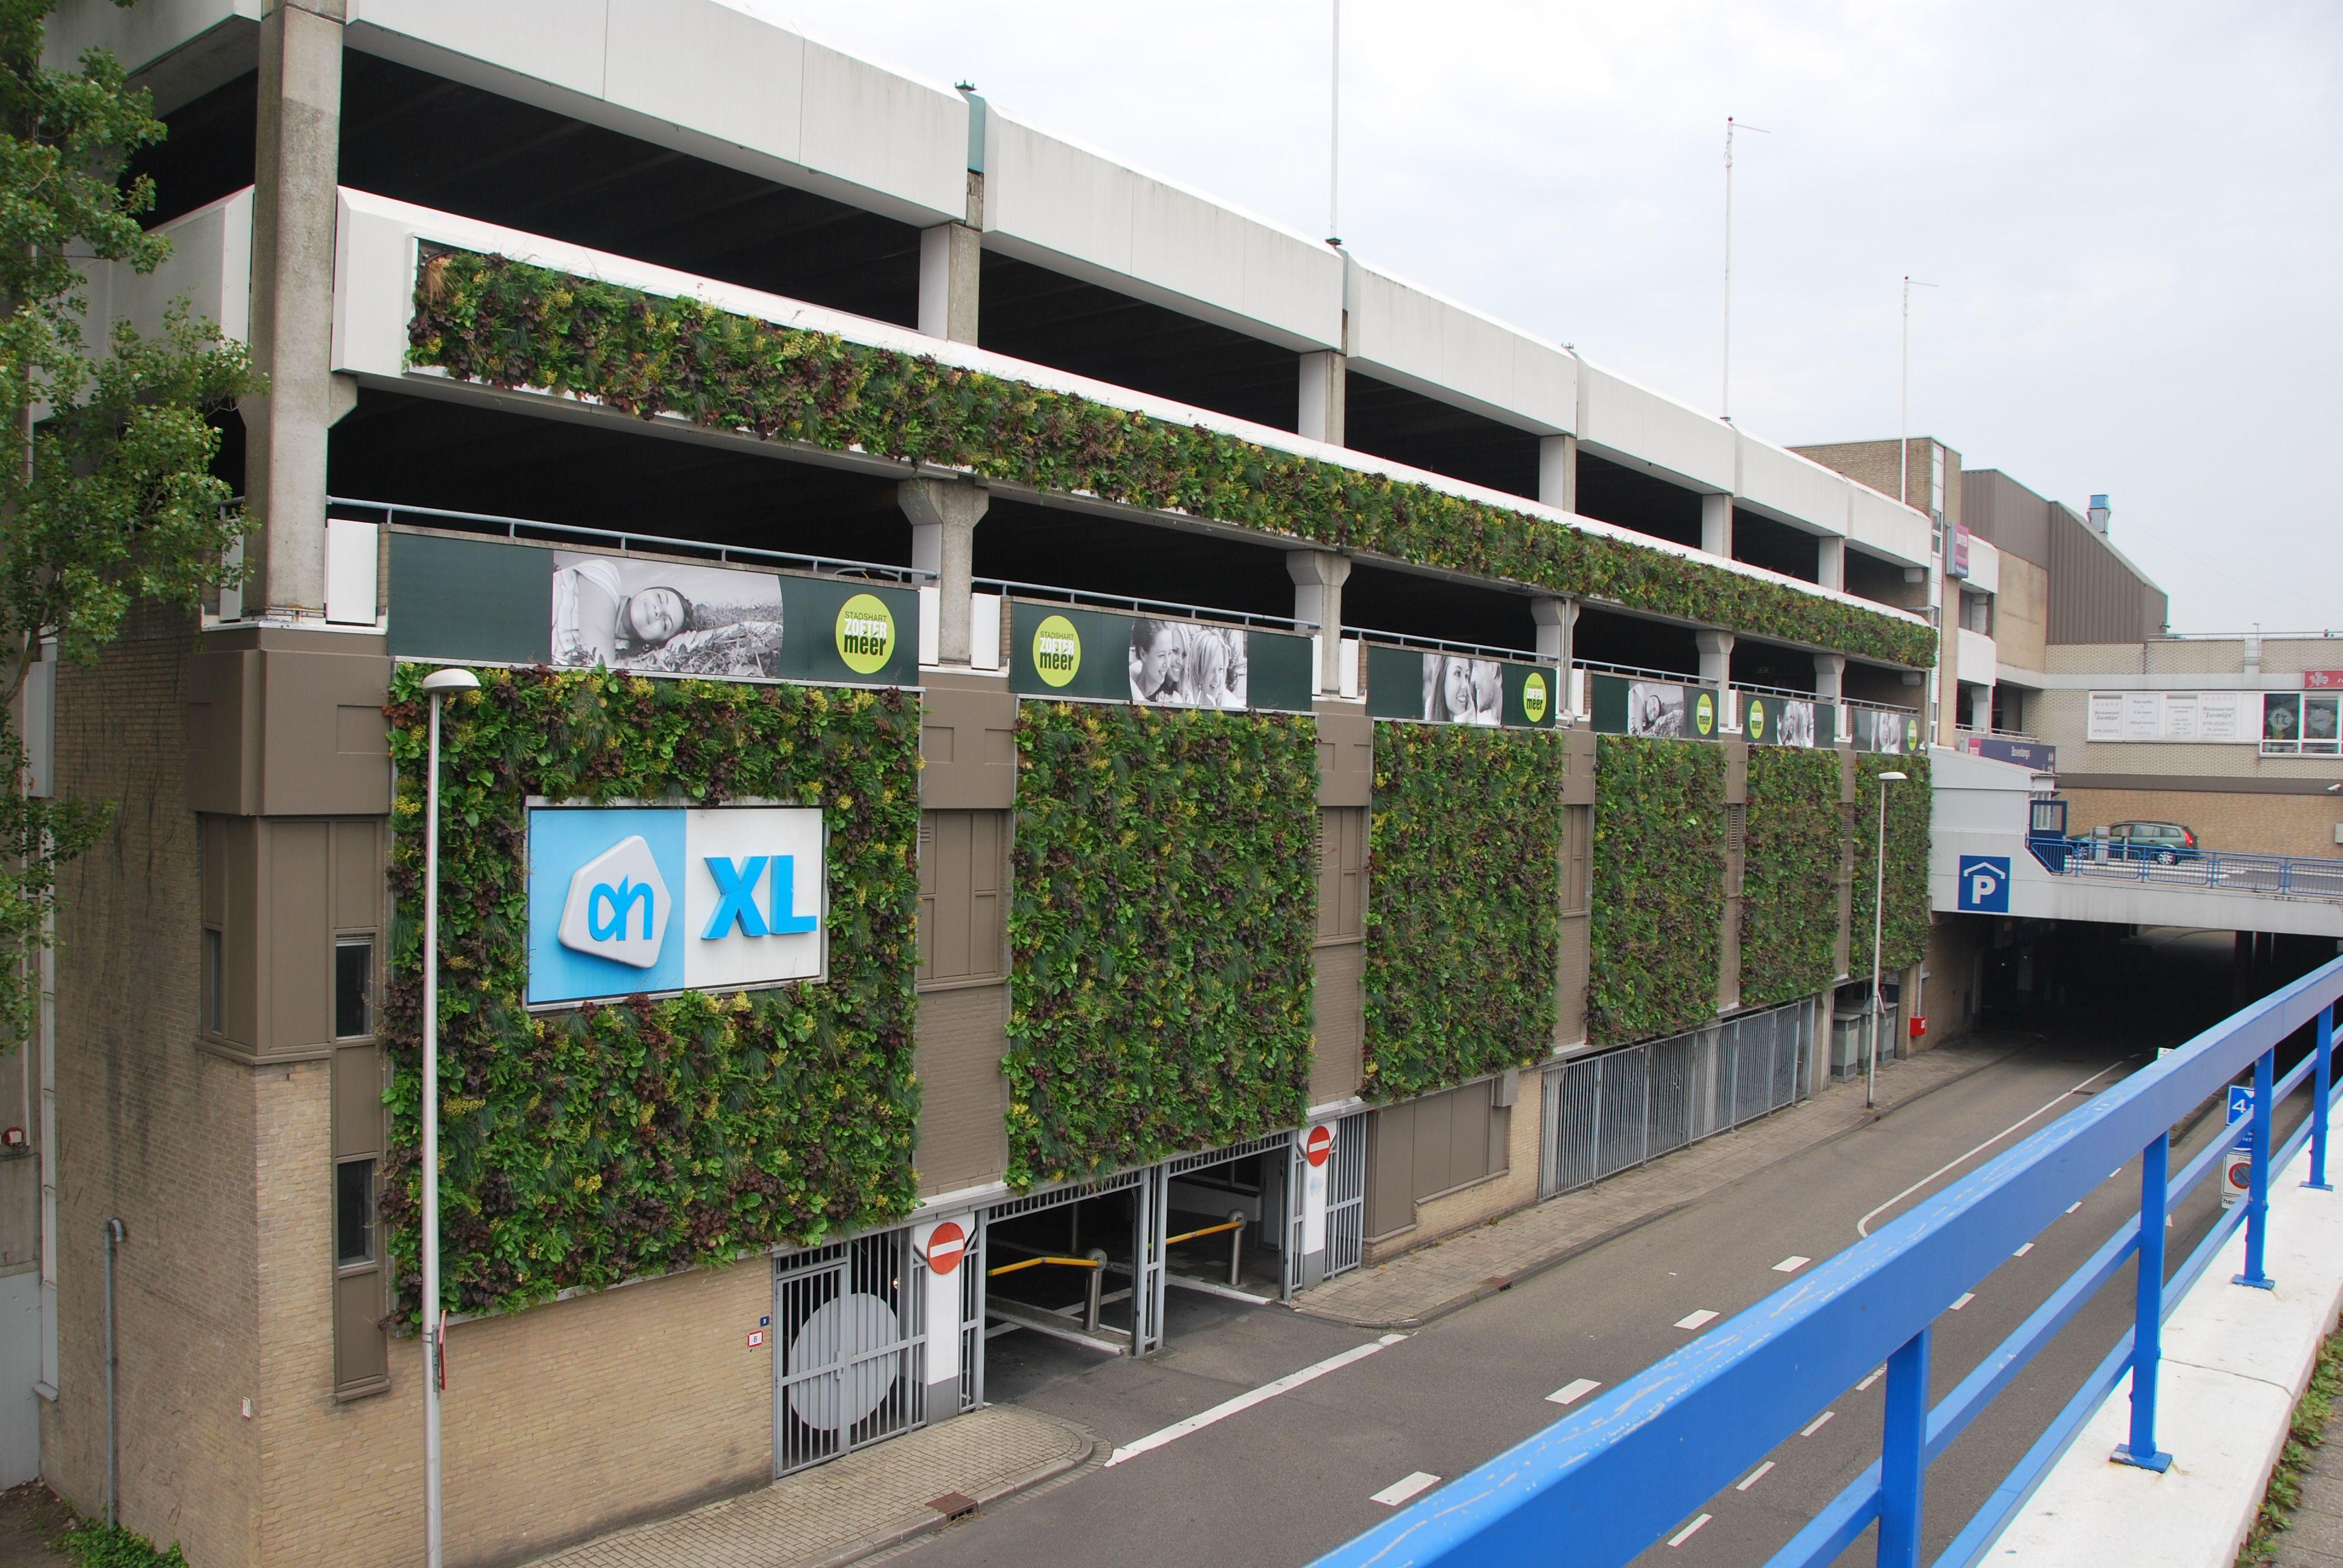 Parking Garage Ivy Wall Google Search Winkelcentrum Gevel Groen